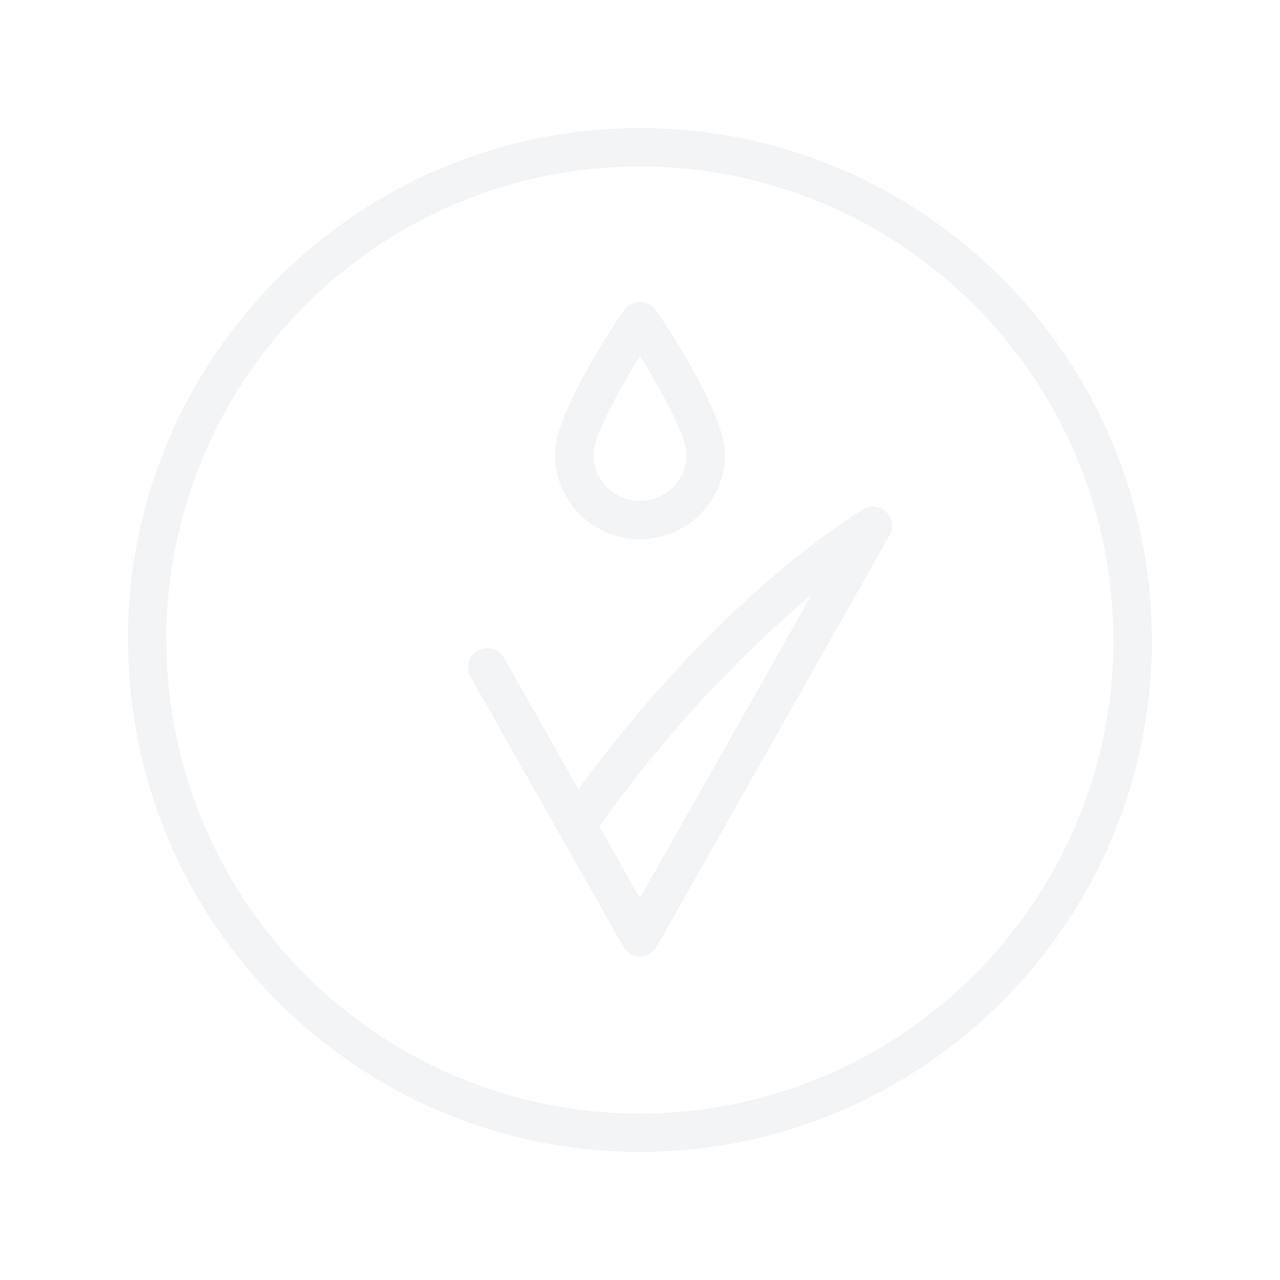 SCHWARZKOPF PROFESSIONAL Mad About Curls Low Foam Cleanser безсульфатный шампунь для вьющихся волос